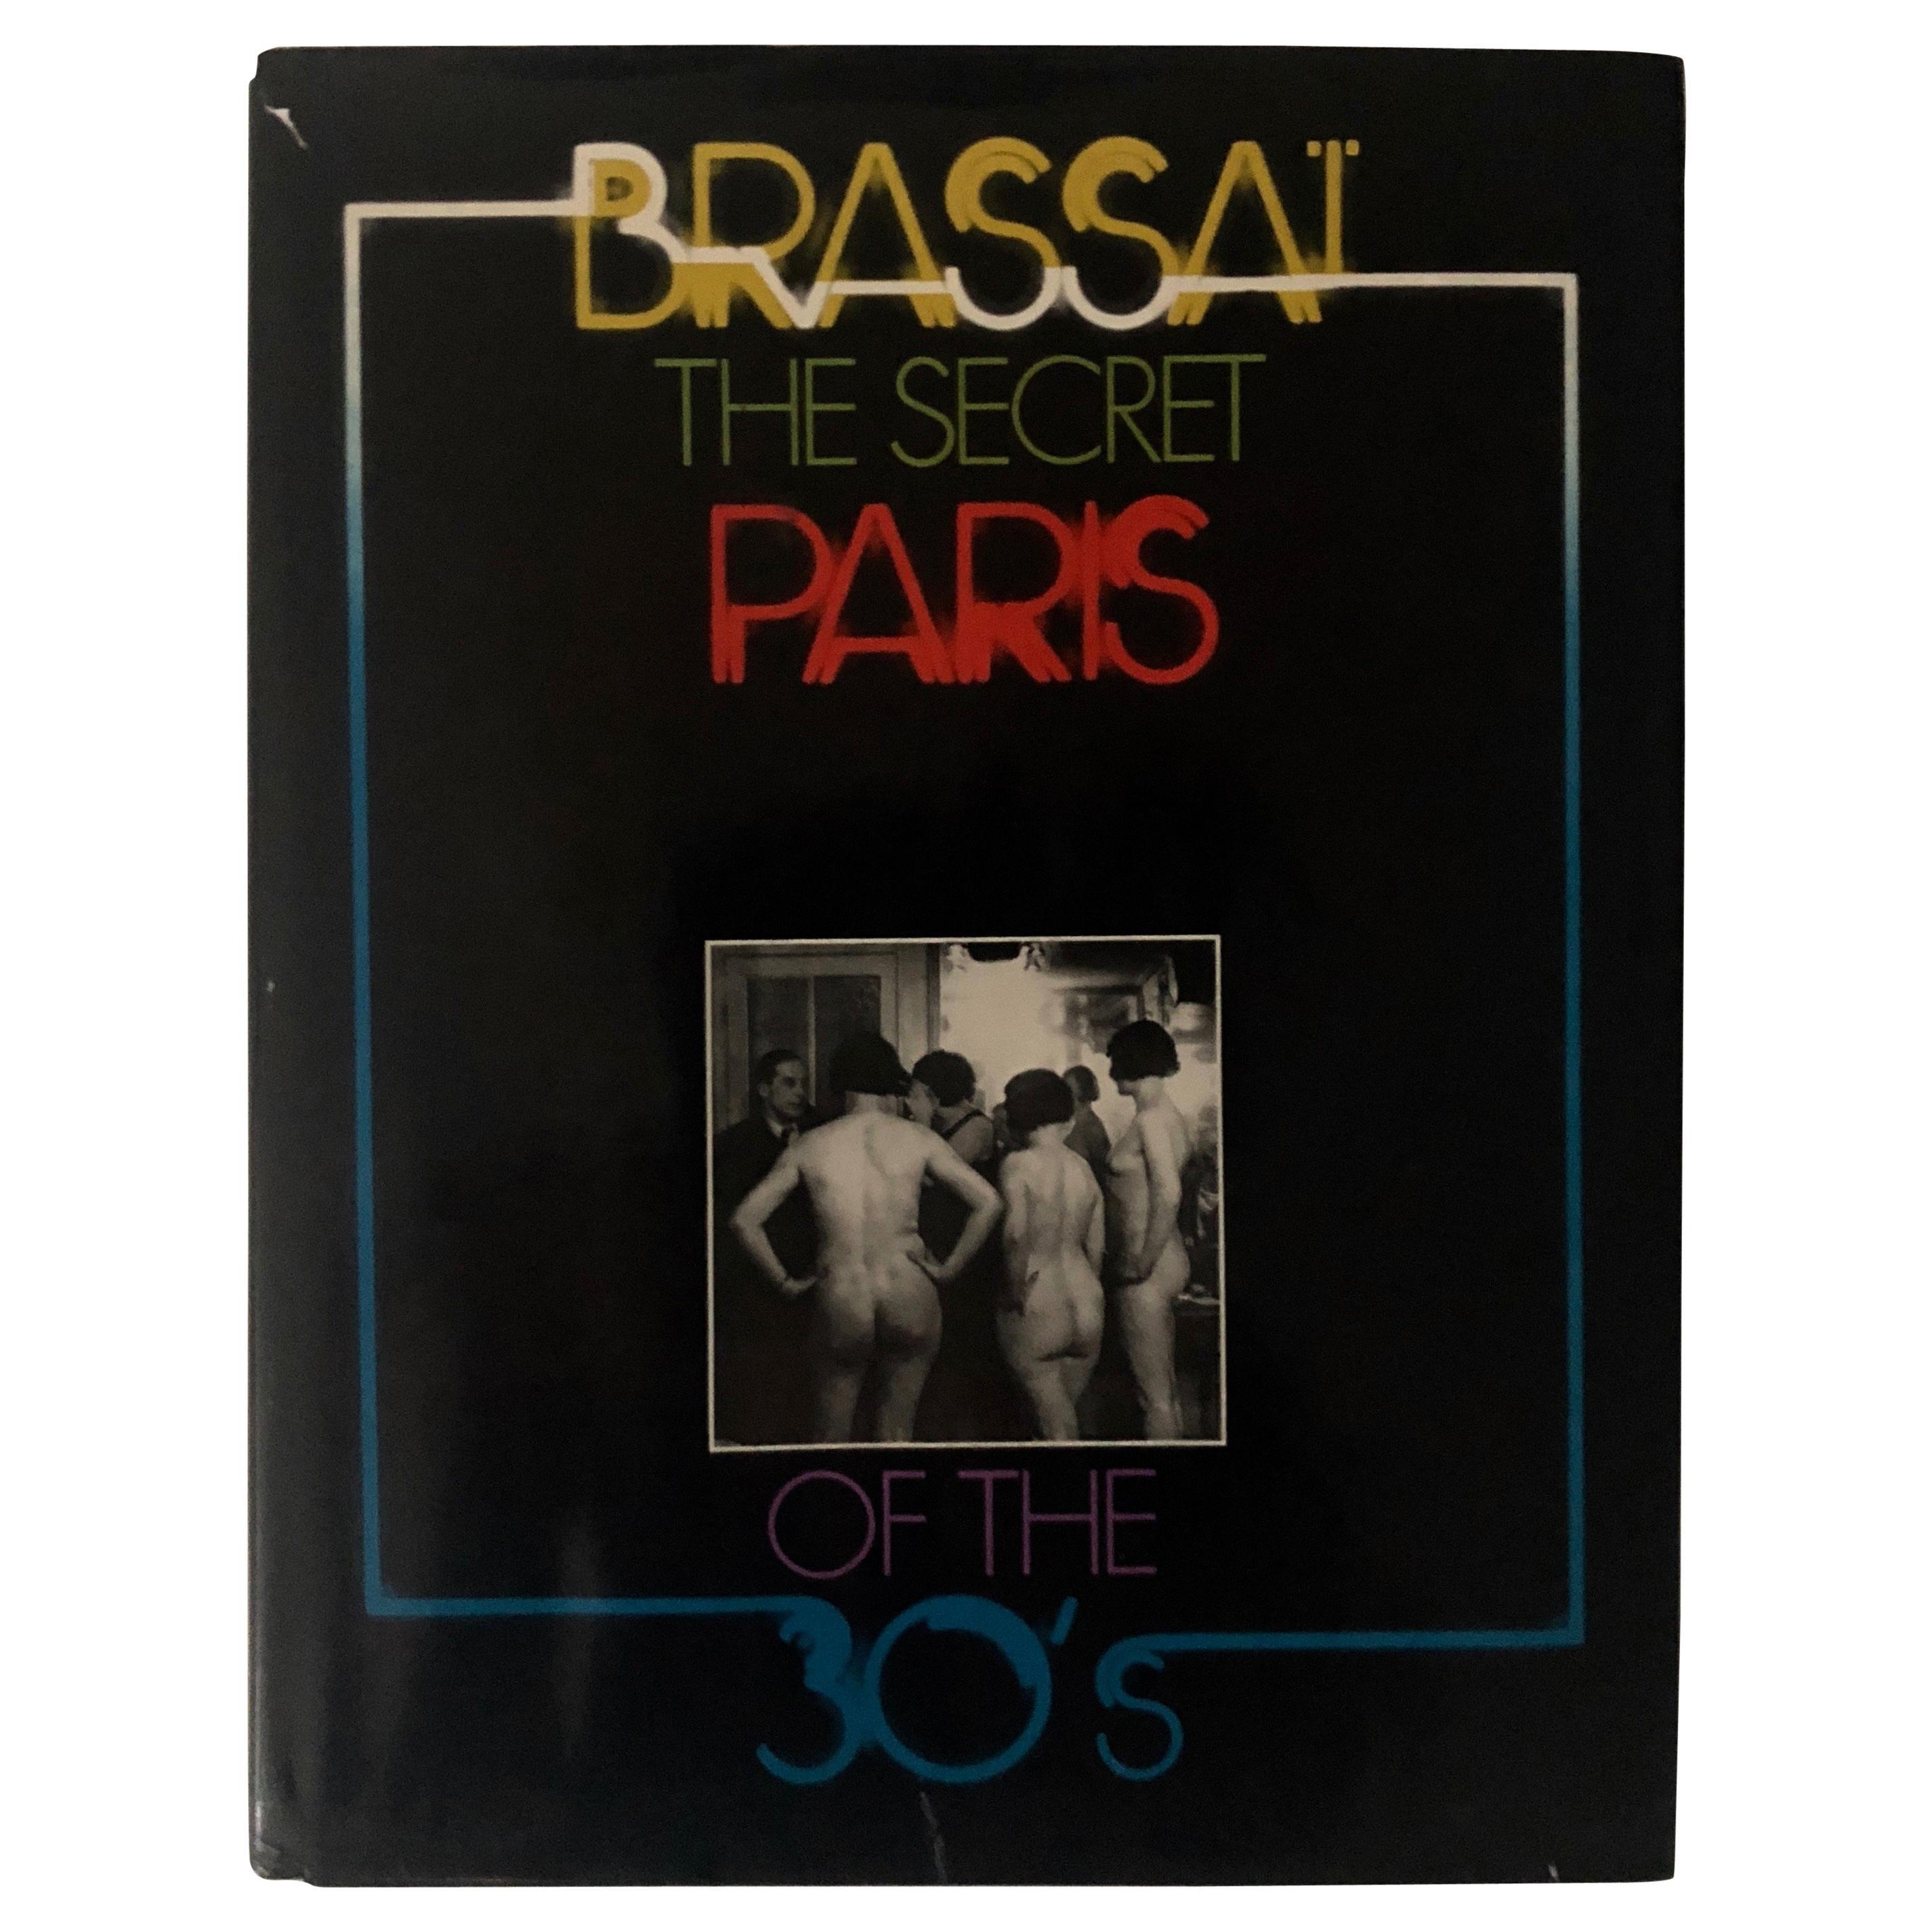 Brassai, the Secret Paris of the 1930s, Signed